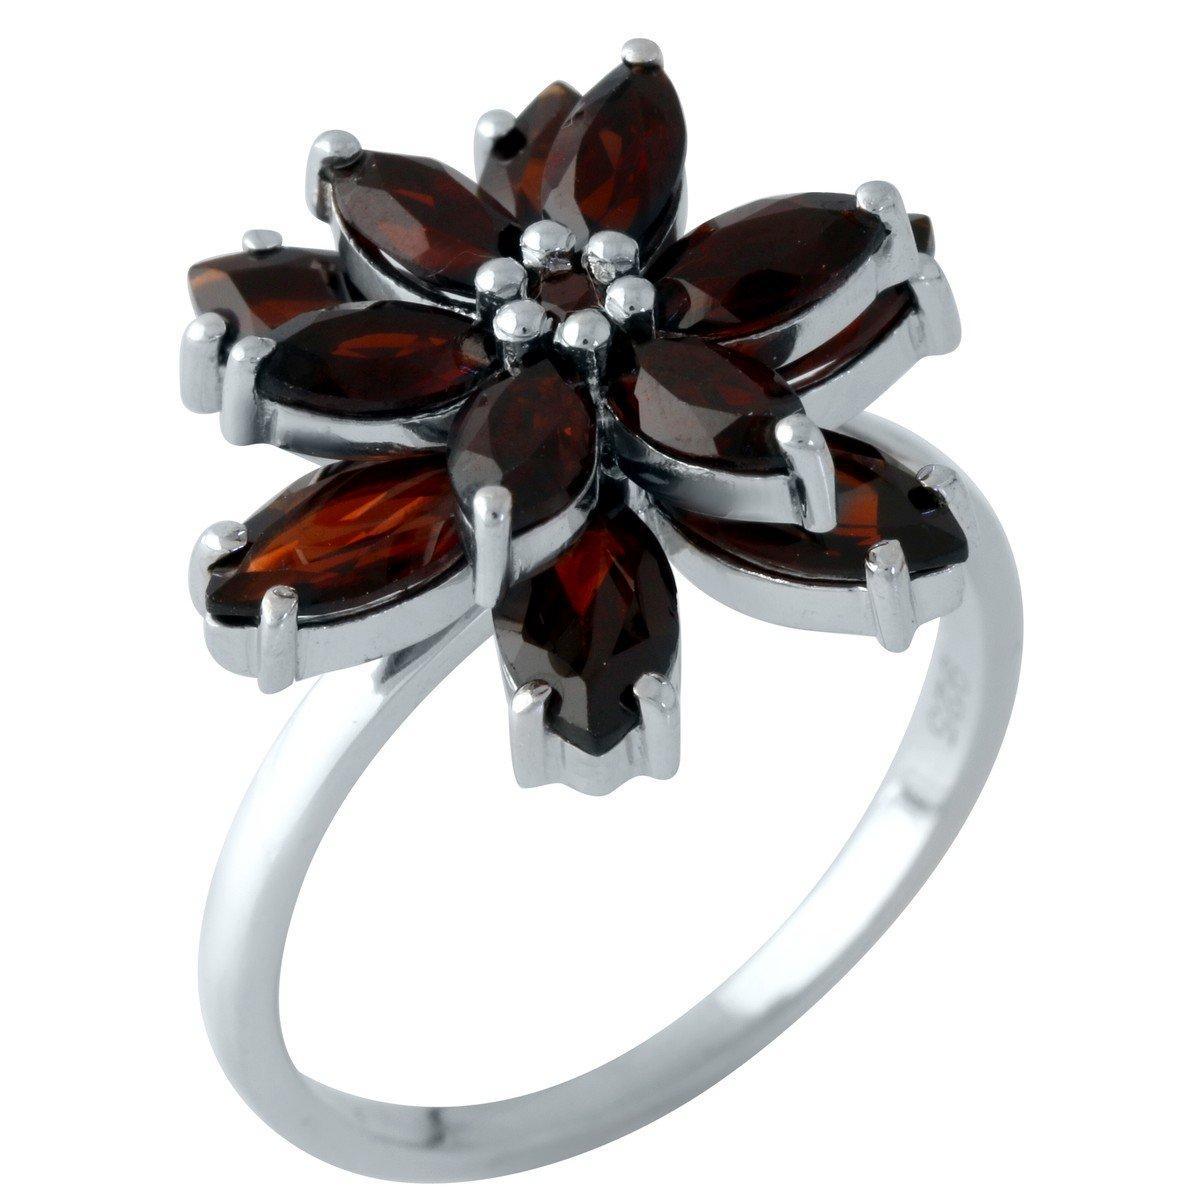 Серебряное кольцо DreamJewelry с натуральным гранатом (1958506) 17 размер